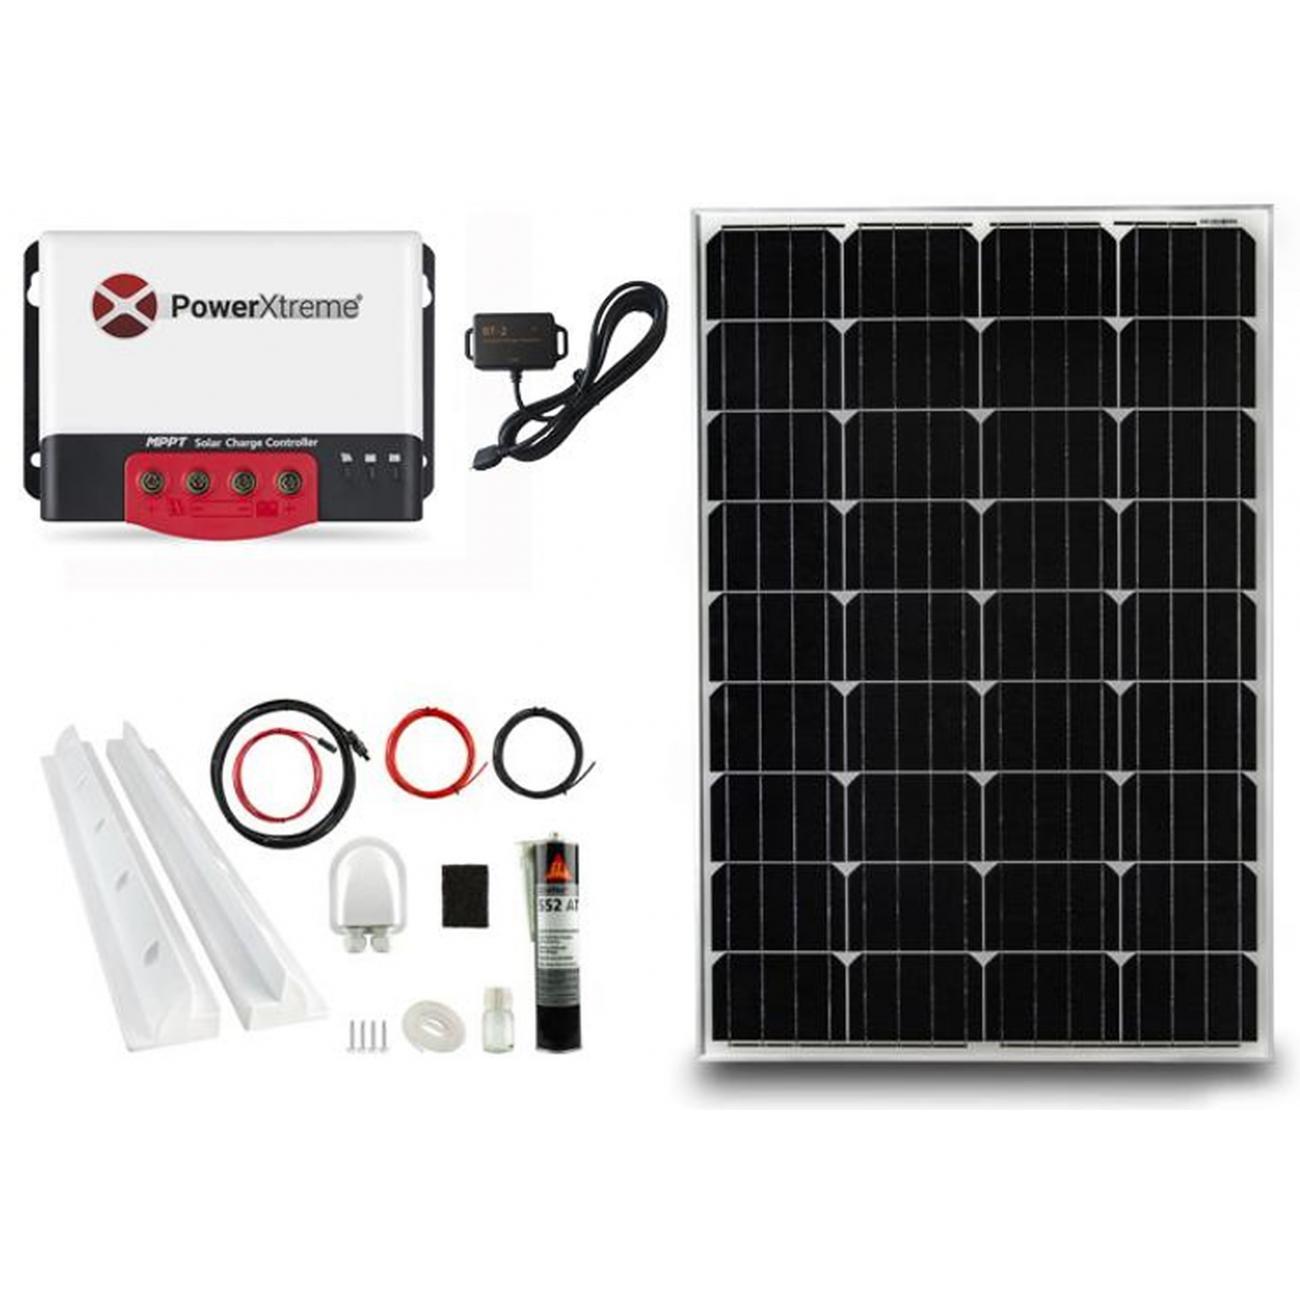 MPPT Solarladeregler PowerXtreme XS20s Mit Bluetooth 260W-Paket